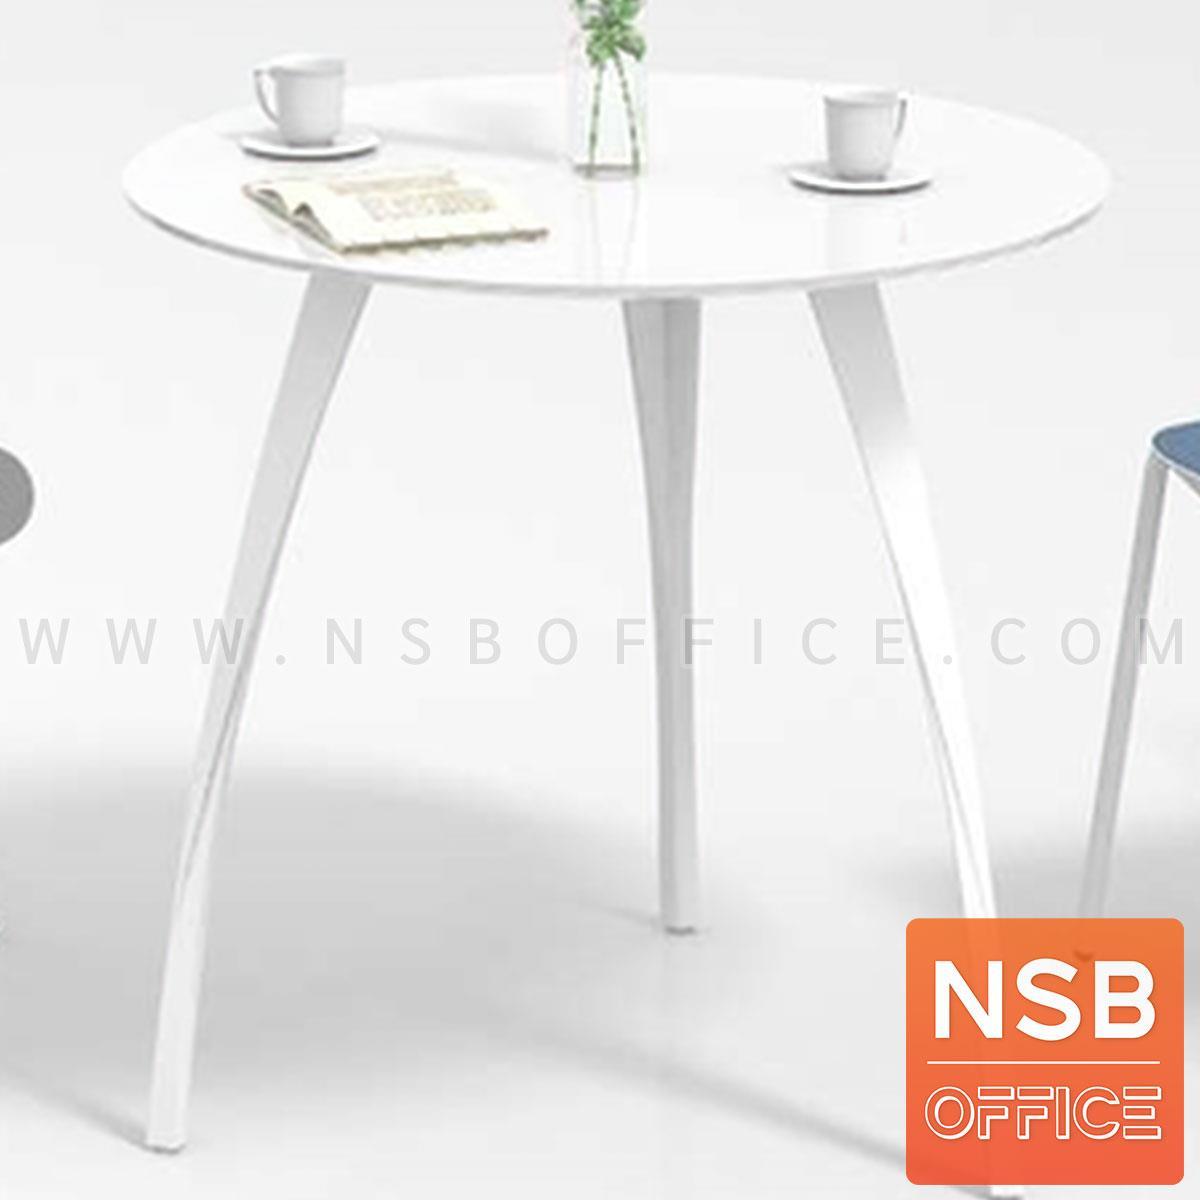 A14A283:โต๊ะทรงกลม รุ่น Mink (มิงค์) ขนาด 90Di cm. ขาเหล็กพ่นสี